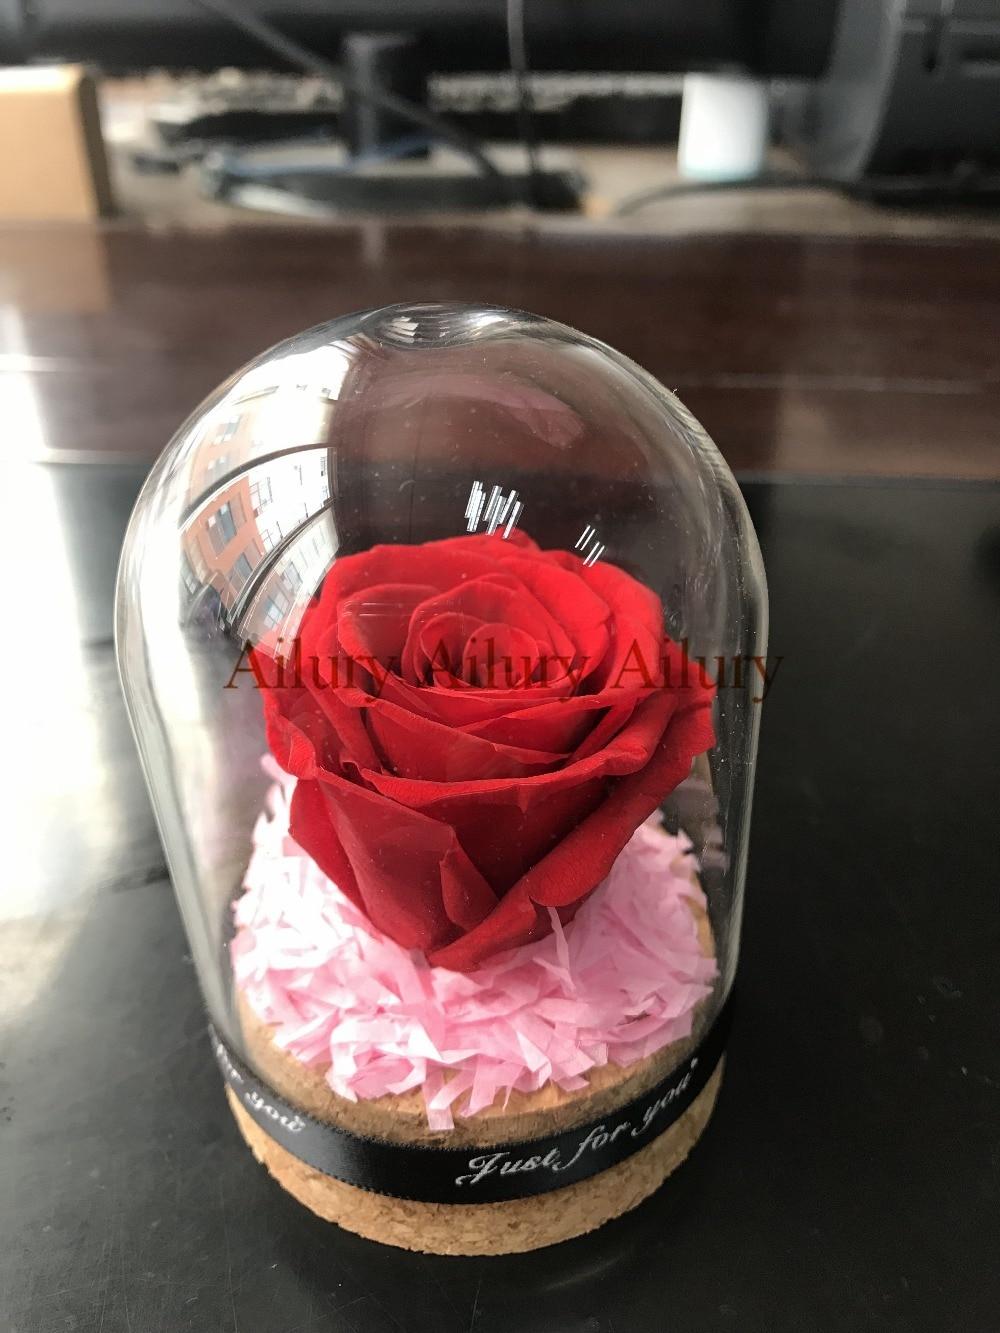 Crimson colour,Mini Everlasting Glass Cowl Recent Preserved Rose Flower.Marriage ceremony Residence Celebration Ornament,Valentine's Day present,desktop decor. glass cowl, ornamental ornamental, flower flower,Low cost glass cowl,Excessive High quality ornamental ornamental,...